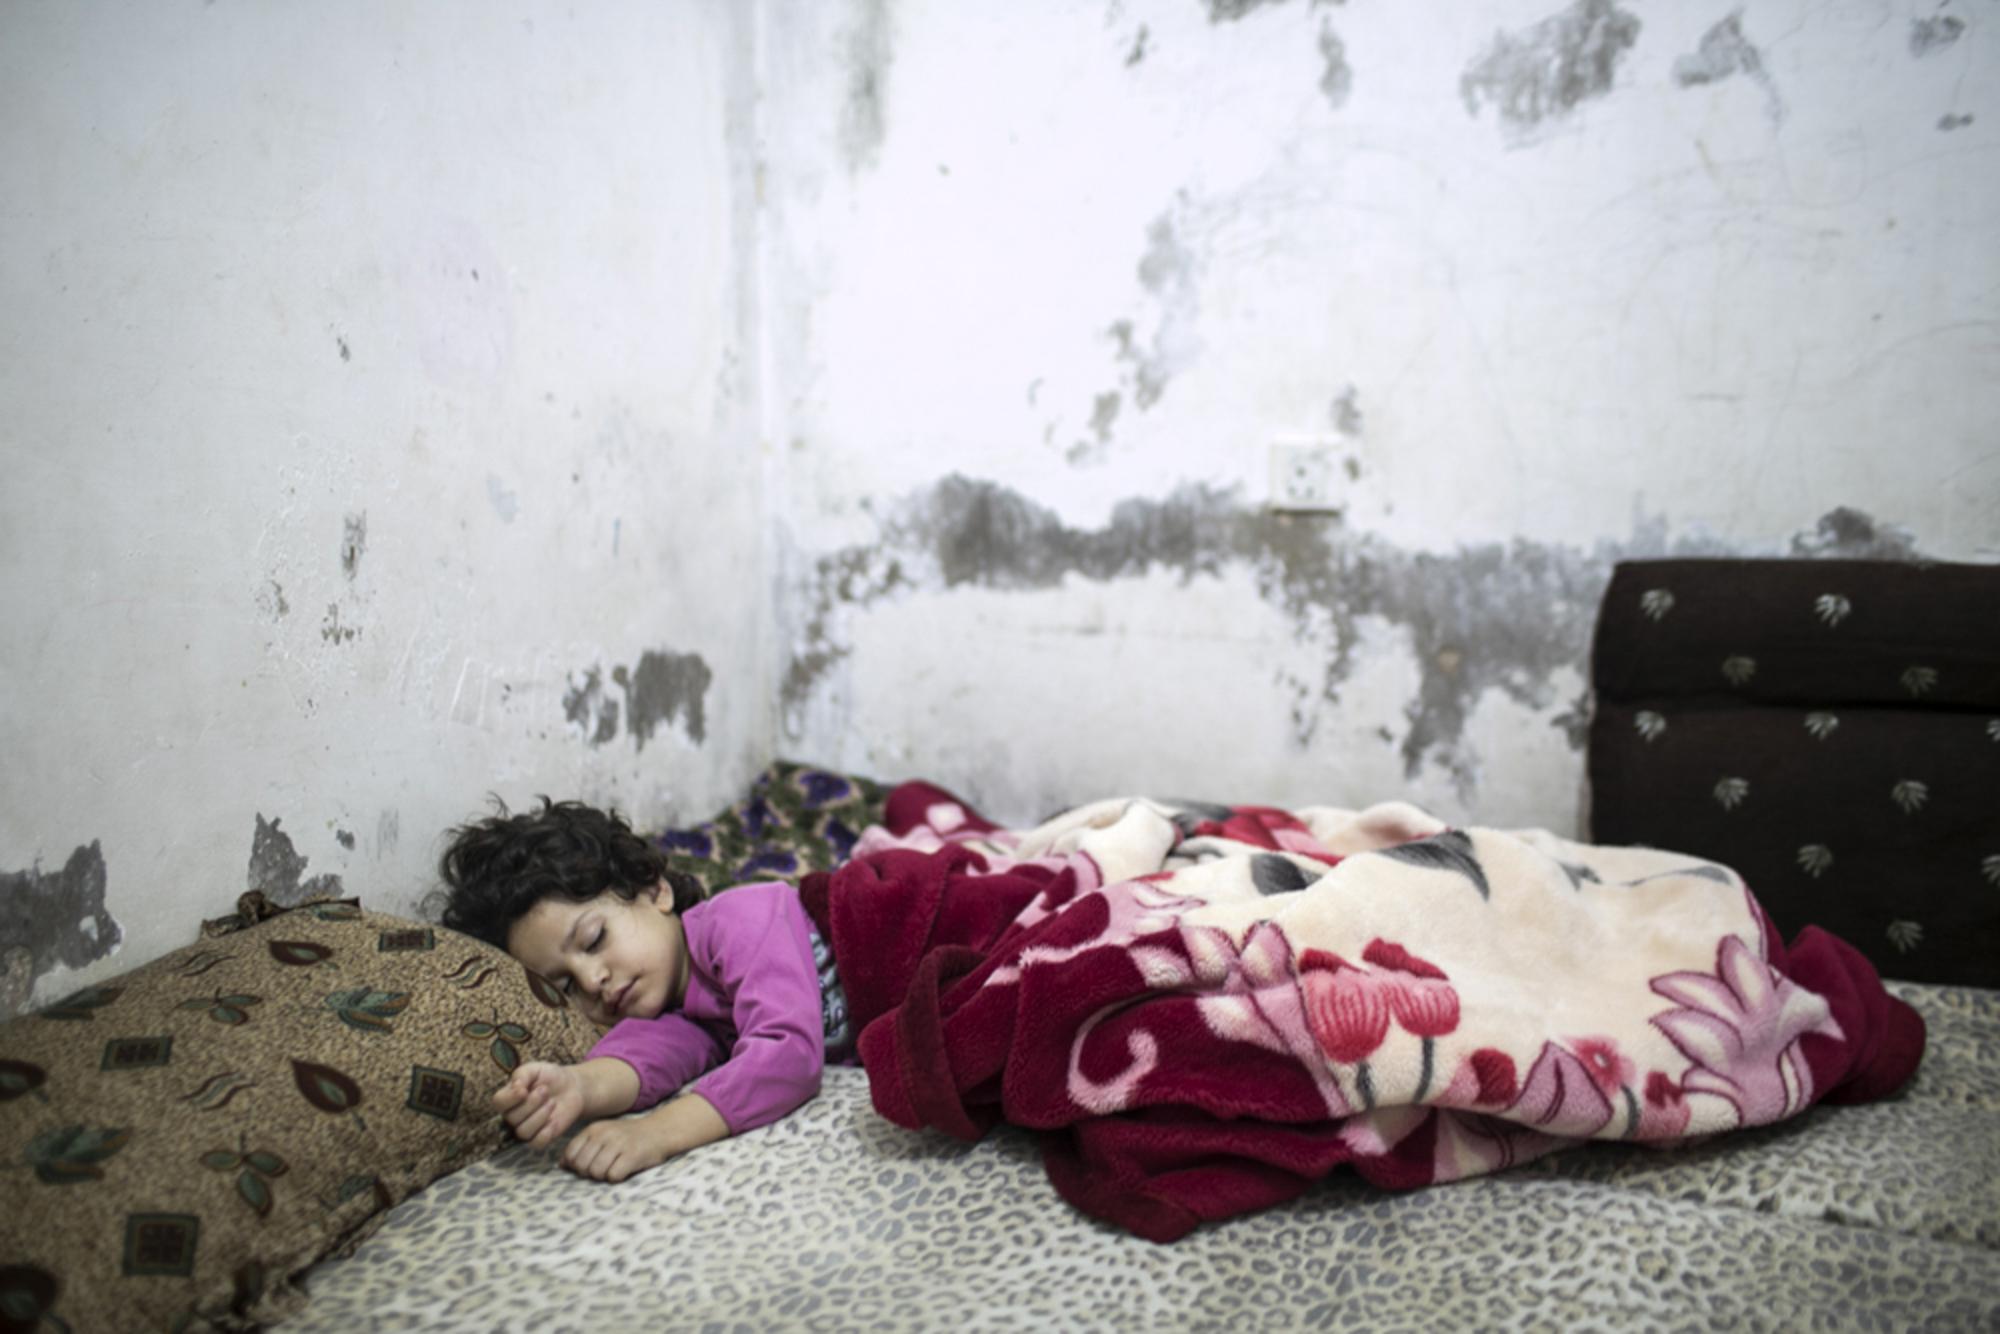 Syria Via whatsapp - by Tanya Habjouqa